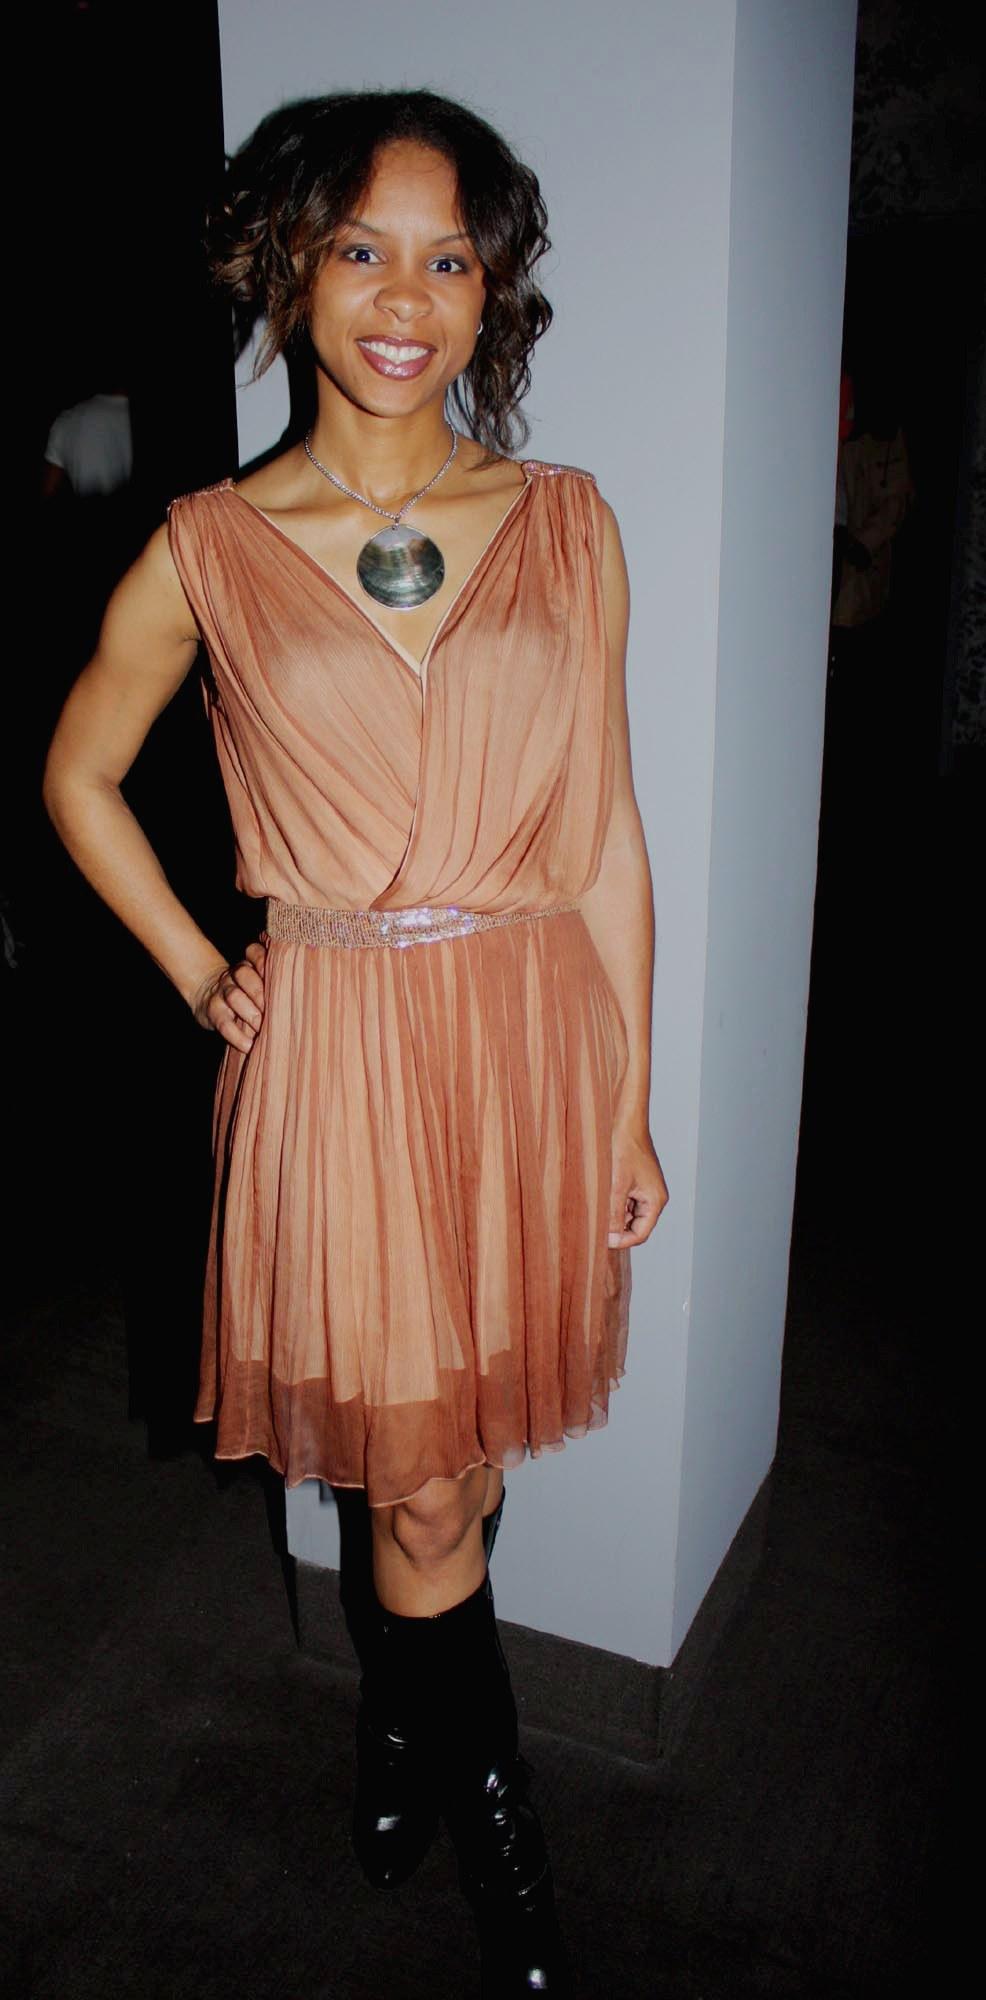 Nichelle Pace wearing Tamara Pogosian